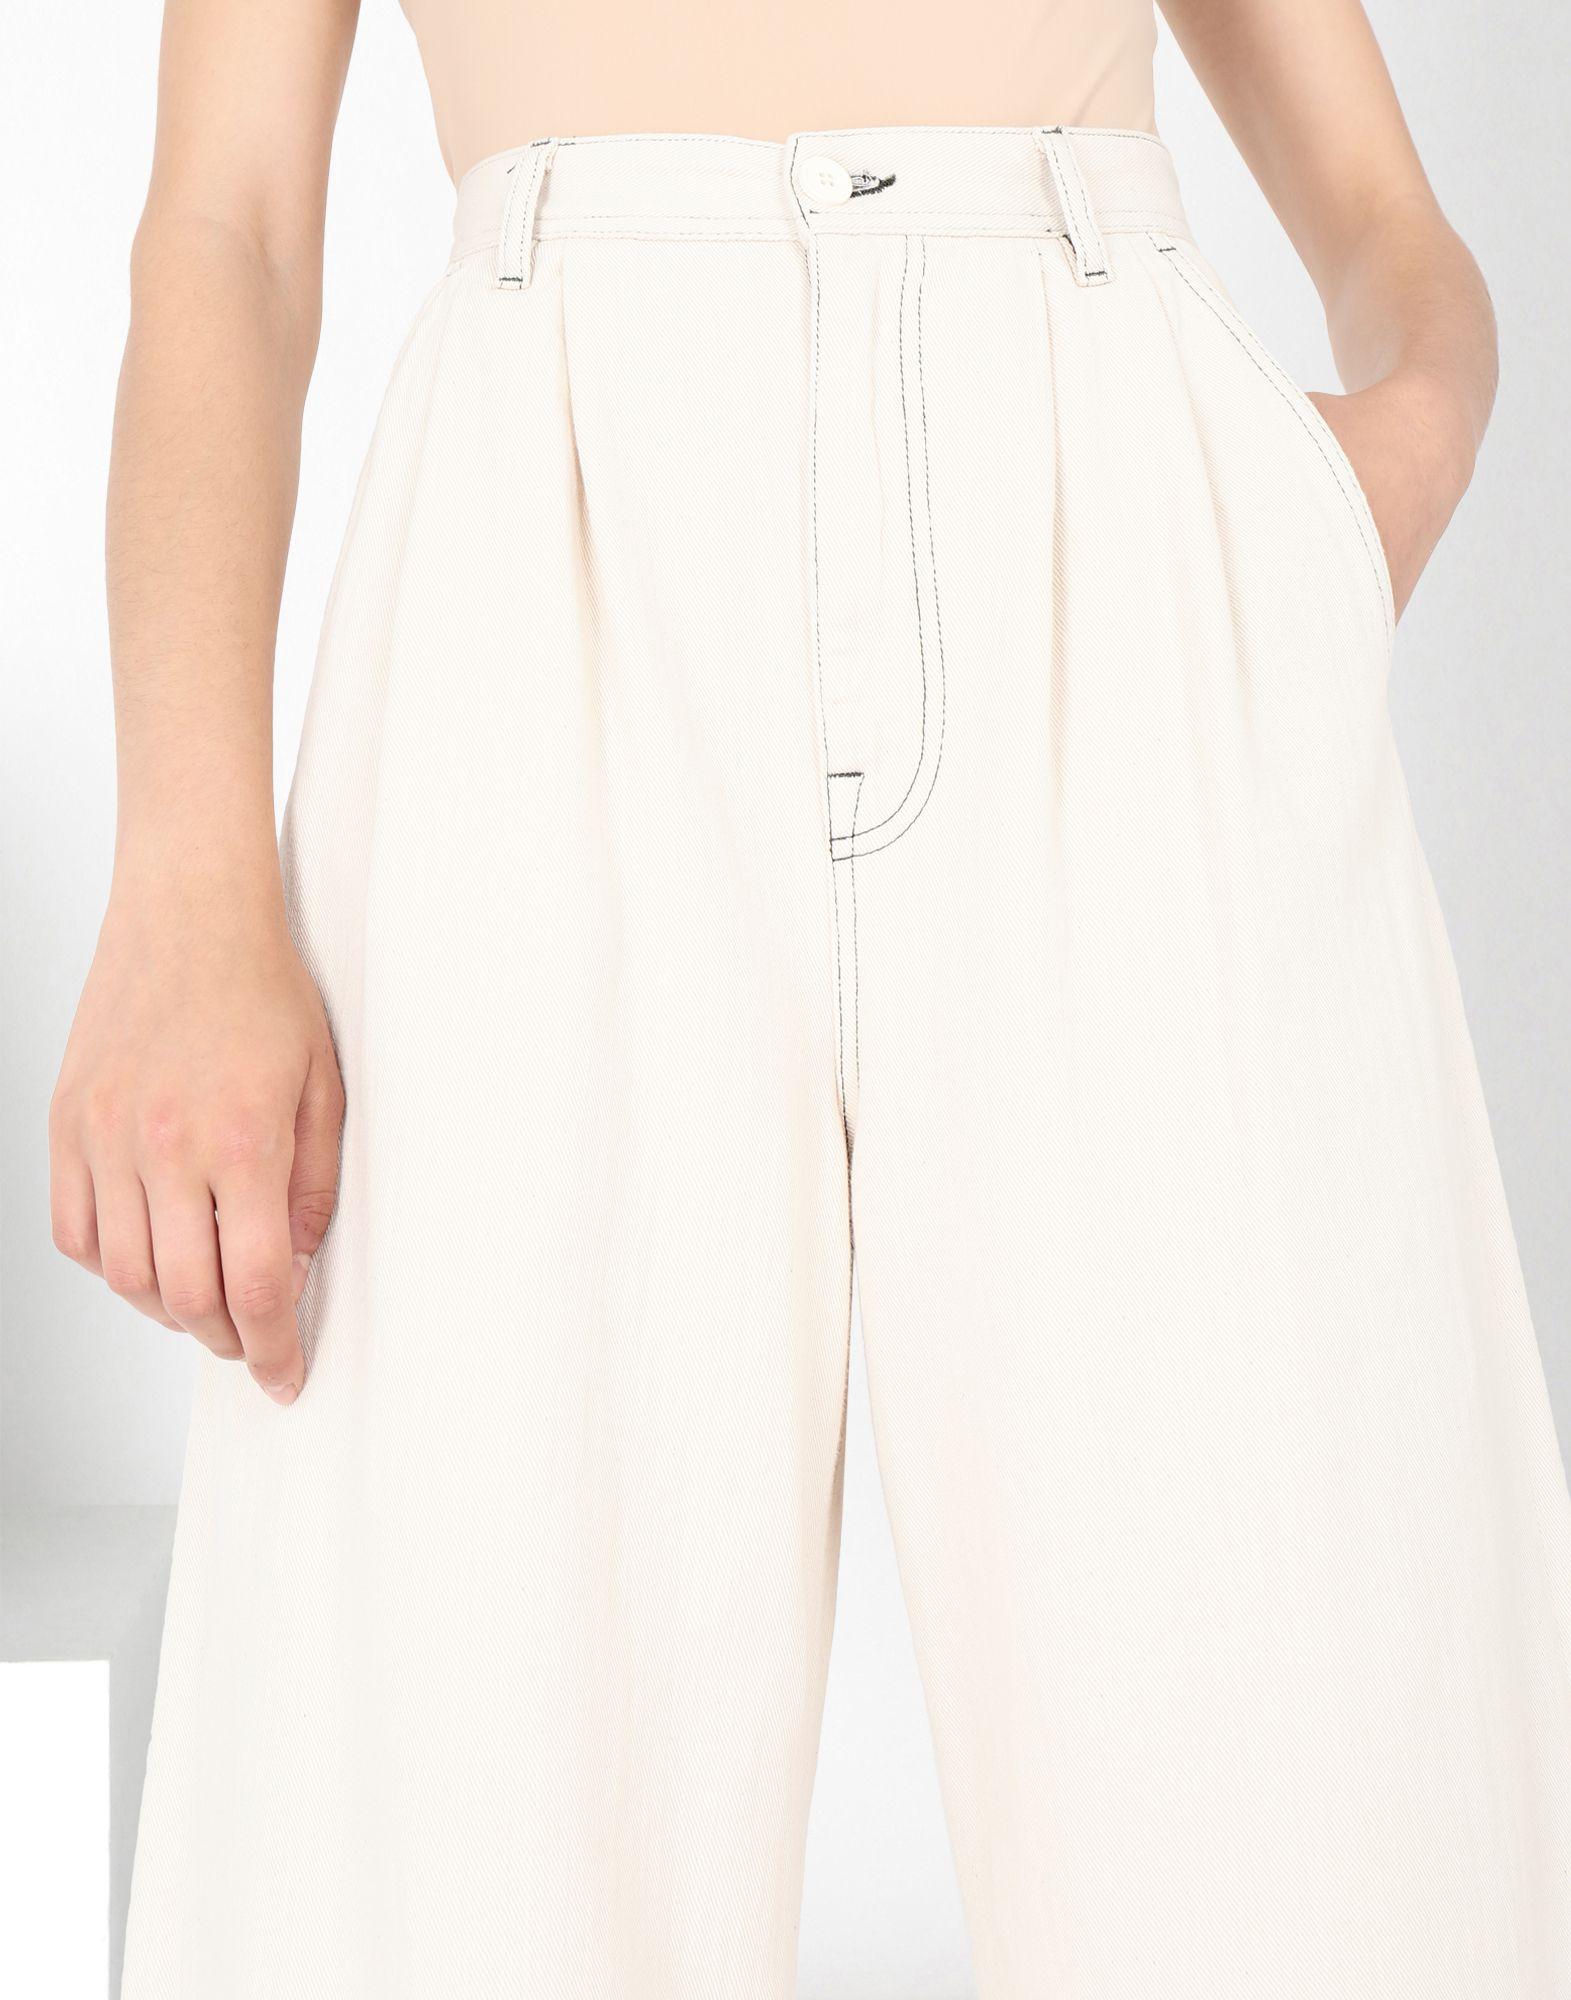 MM6 MAISON MARGIELA Flared cotton trousers Casual pants Woman e